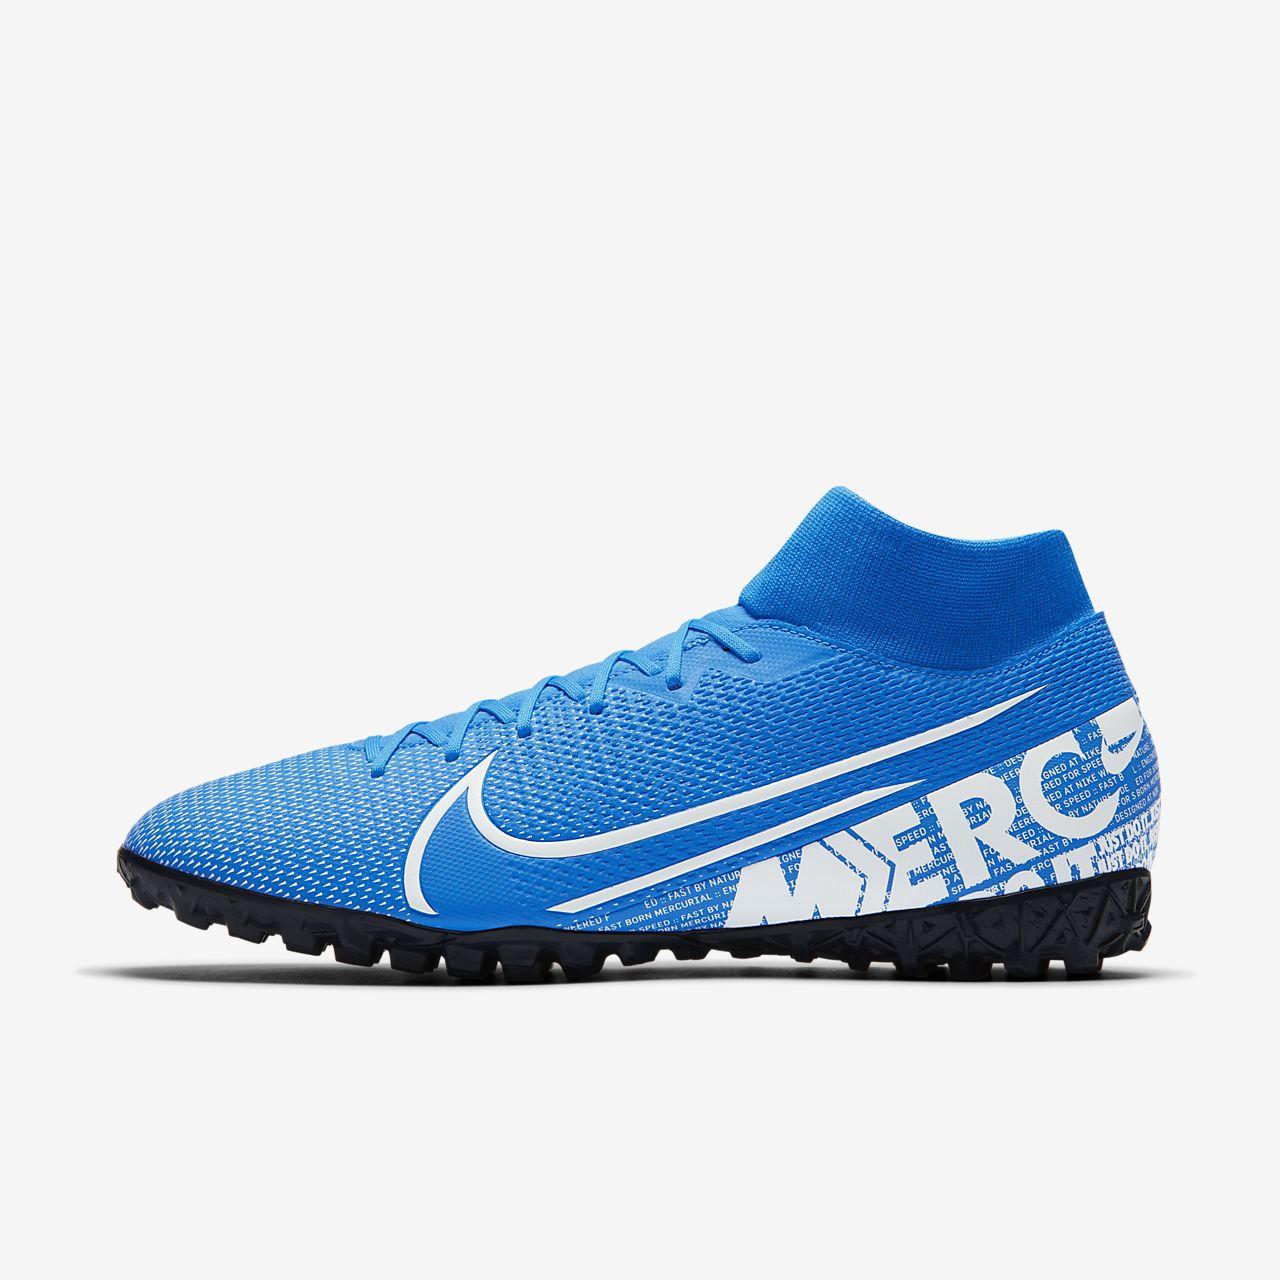 Runner Nike Md Fitnessschoenen Heren 2 Groenzwart bYfg7v6y